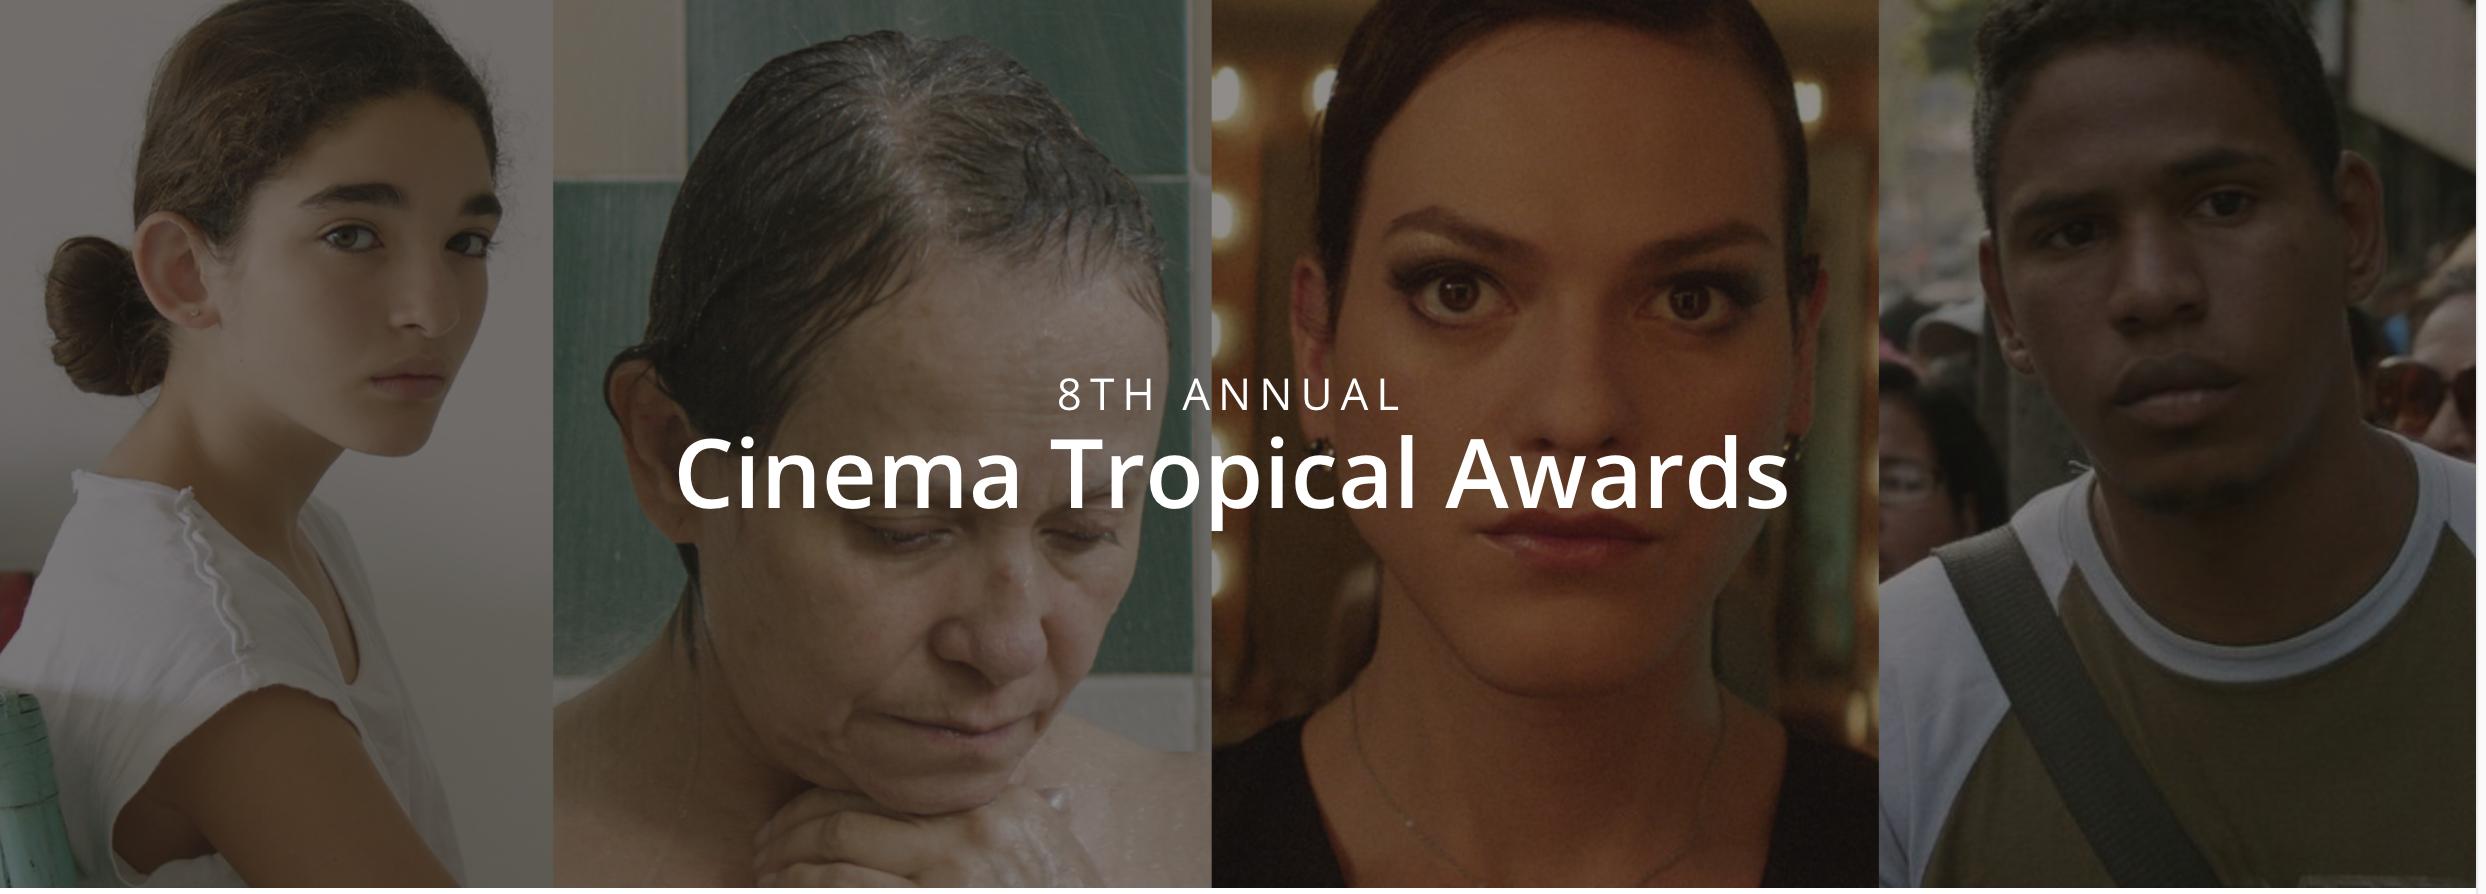 8th Annual Cinema Tropical Awards